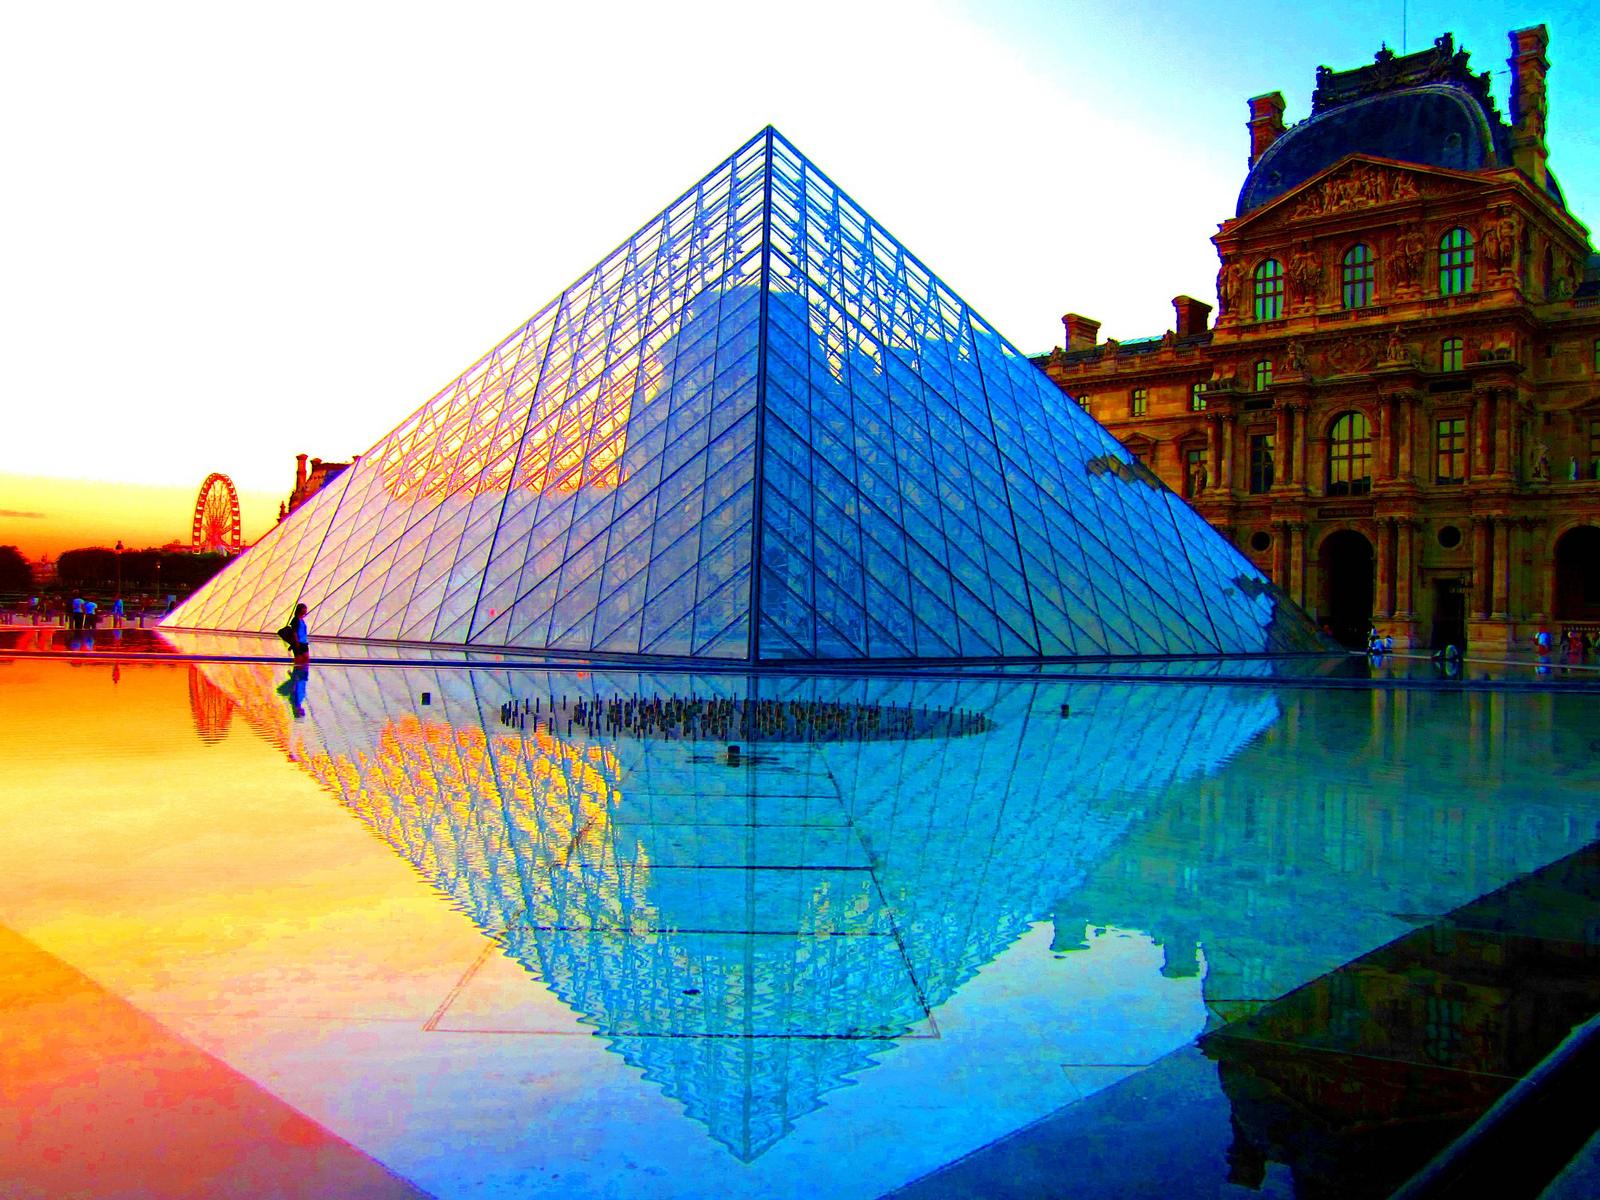 Hotels Near The Louvre Paris France